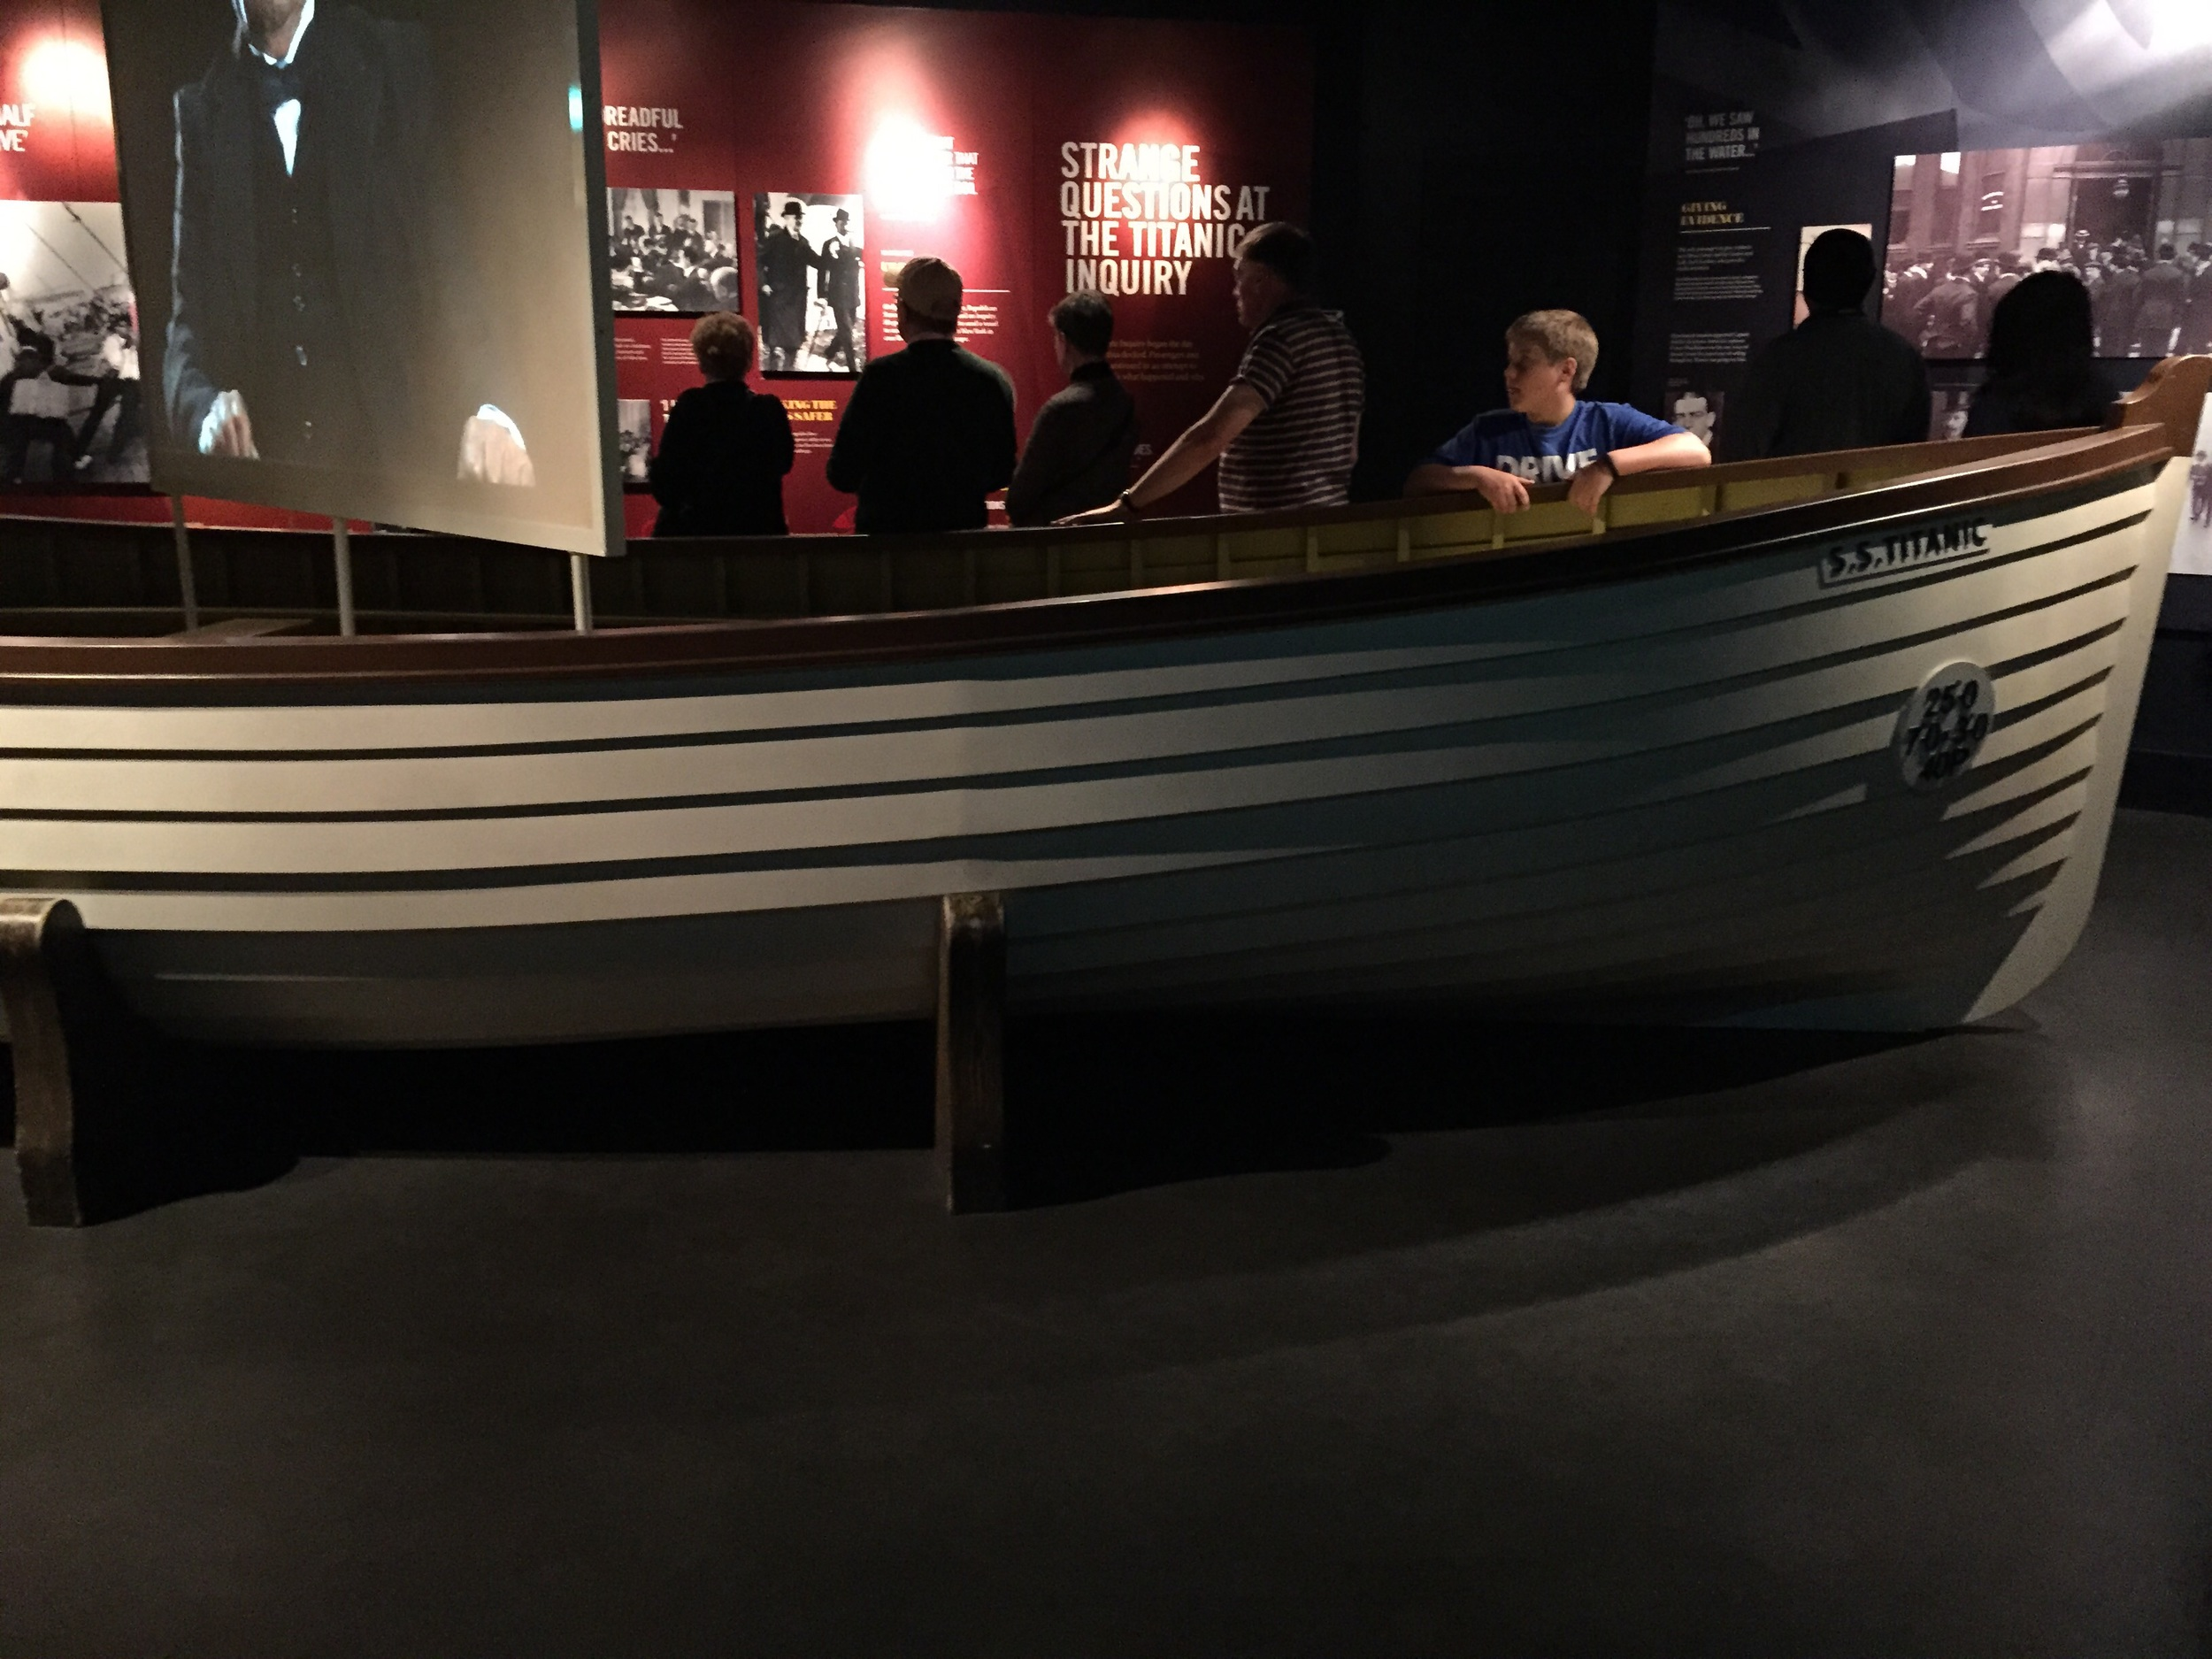 Titanic's life boats.